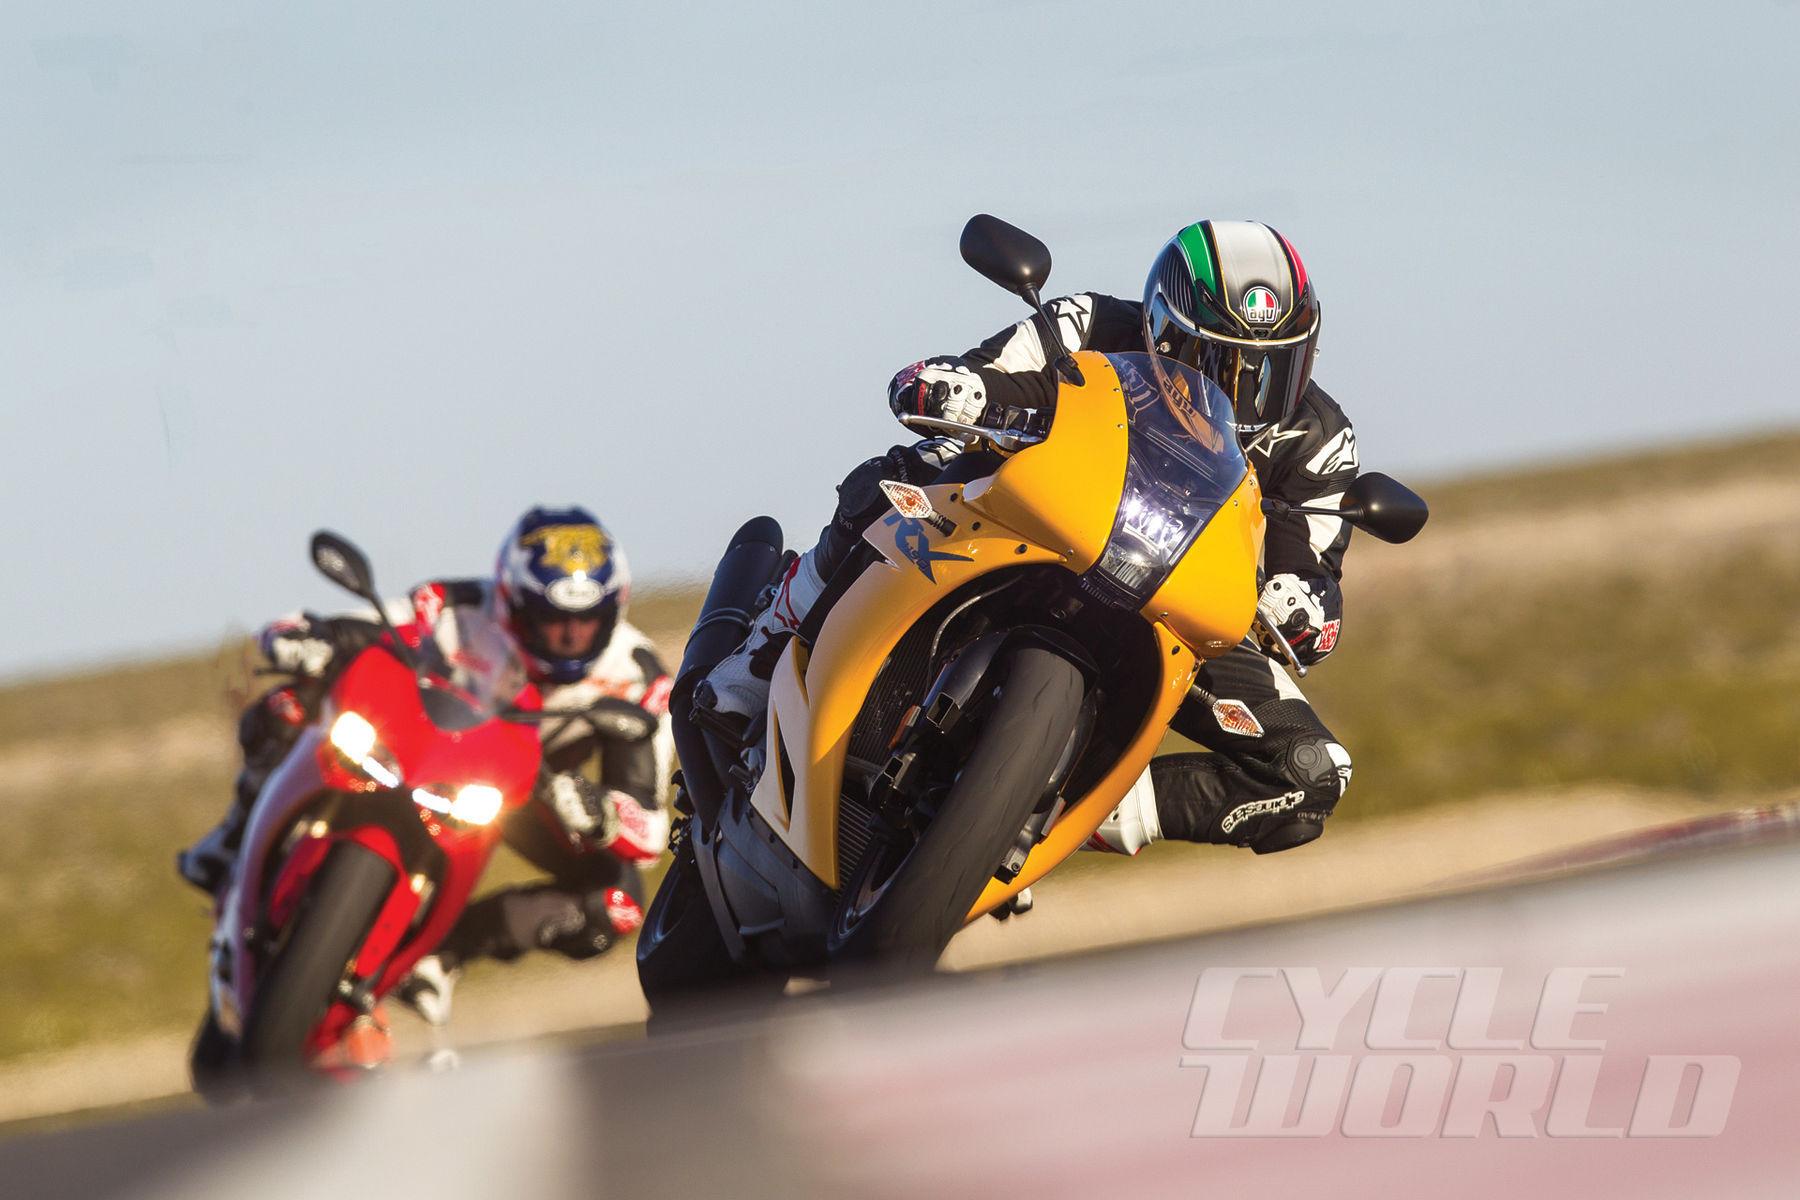 2014 Ducati 1199 PANIGALE | Ducati 1199 Panigale vs. EBR 1190RX – Superbike Comparison Test